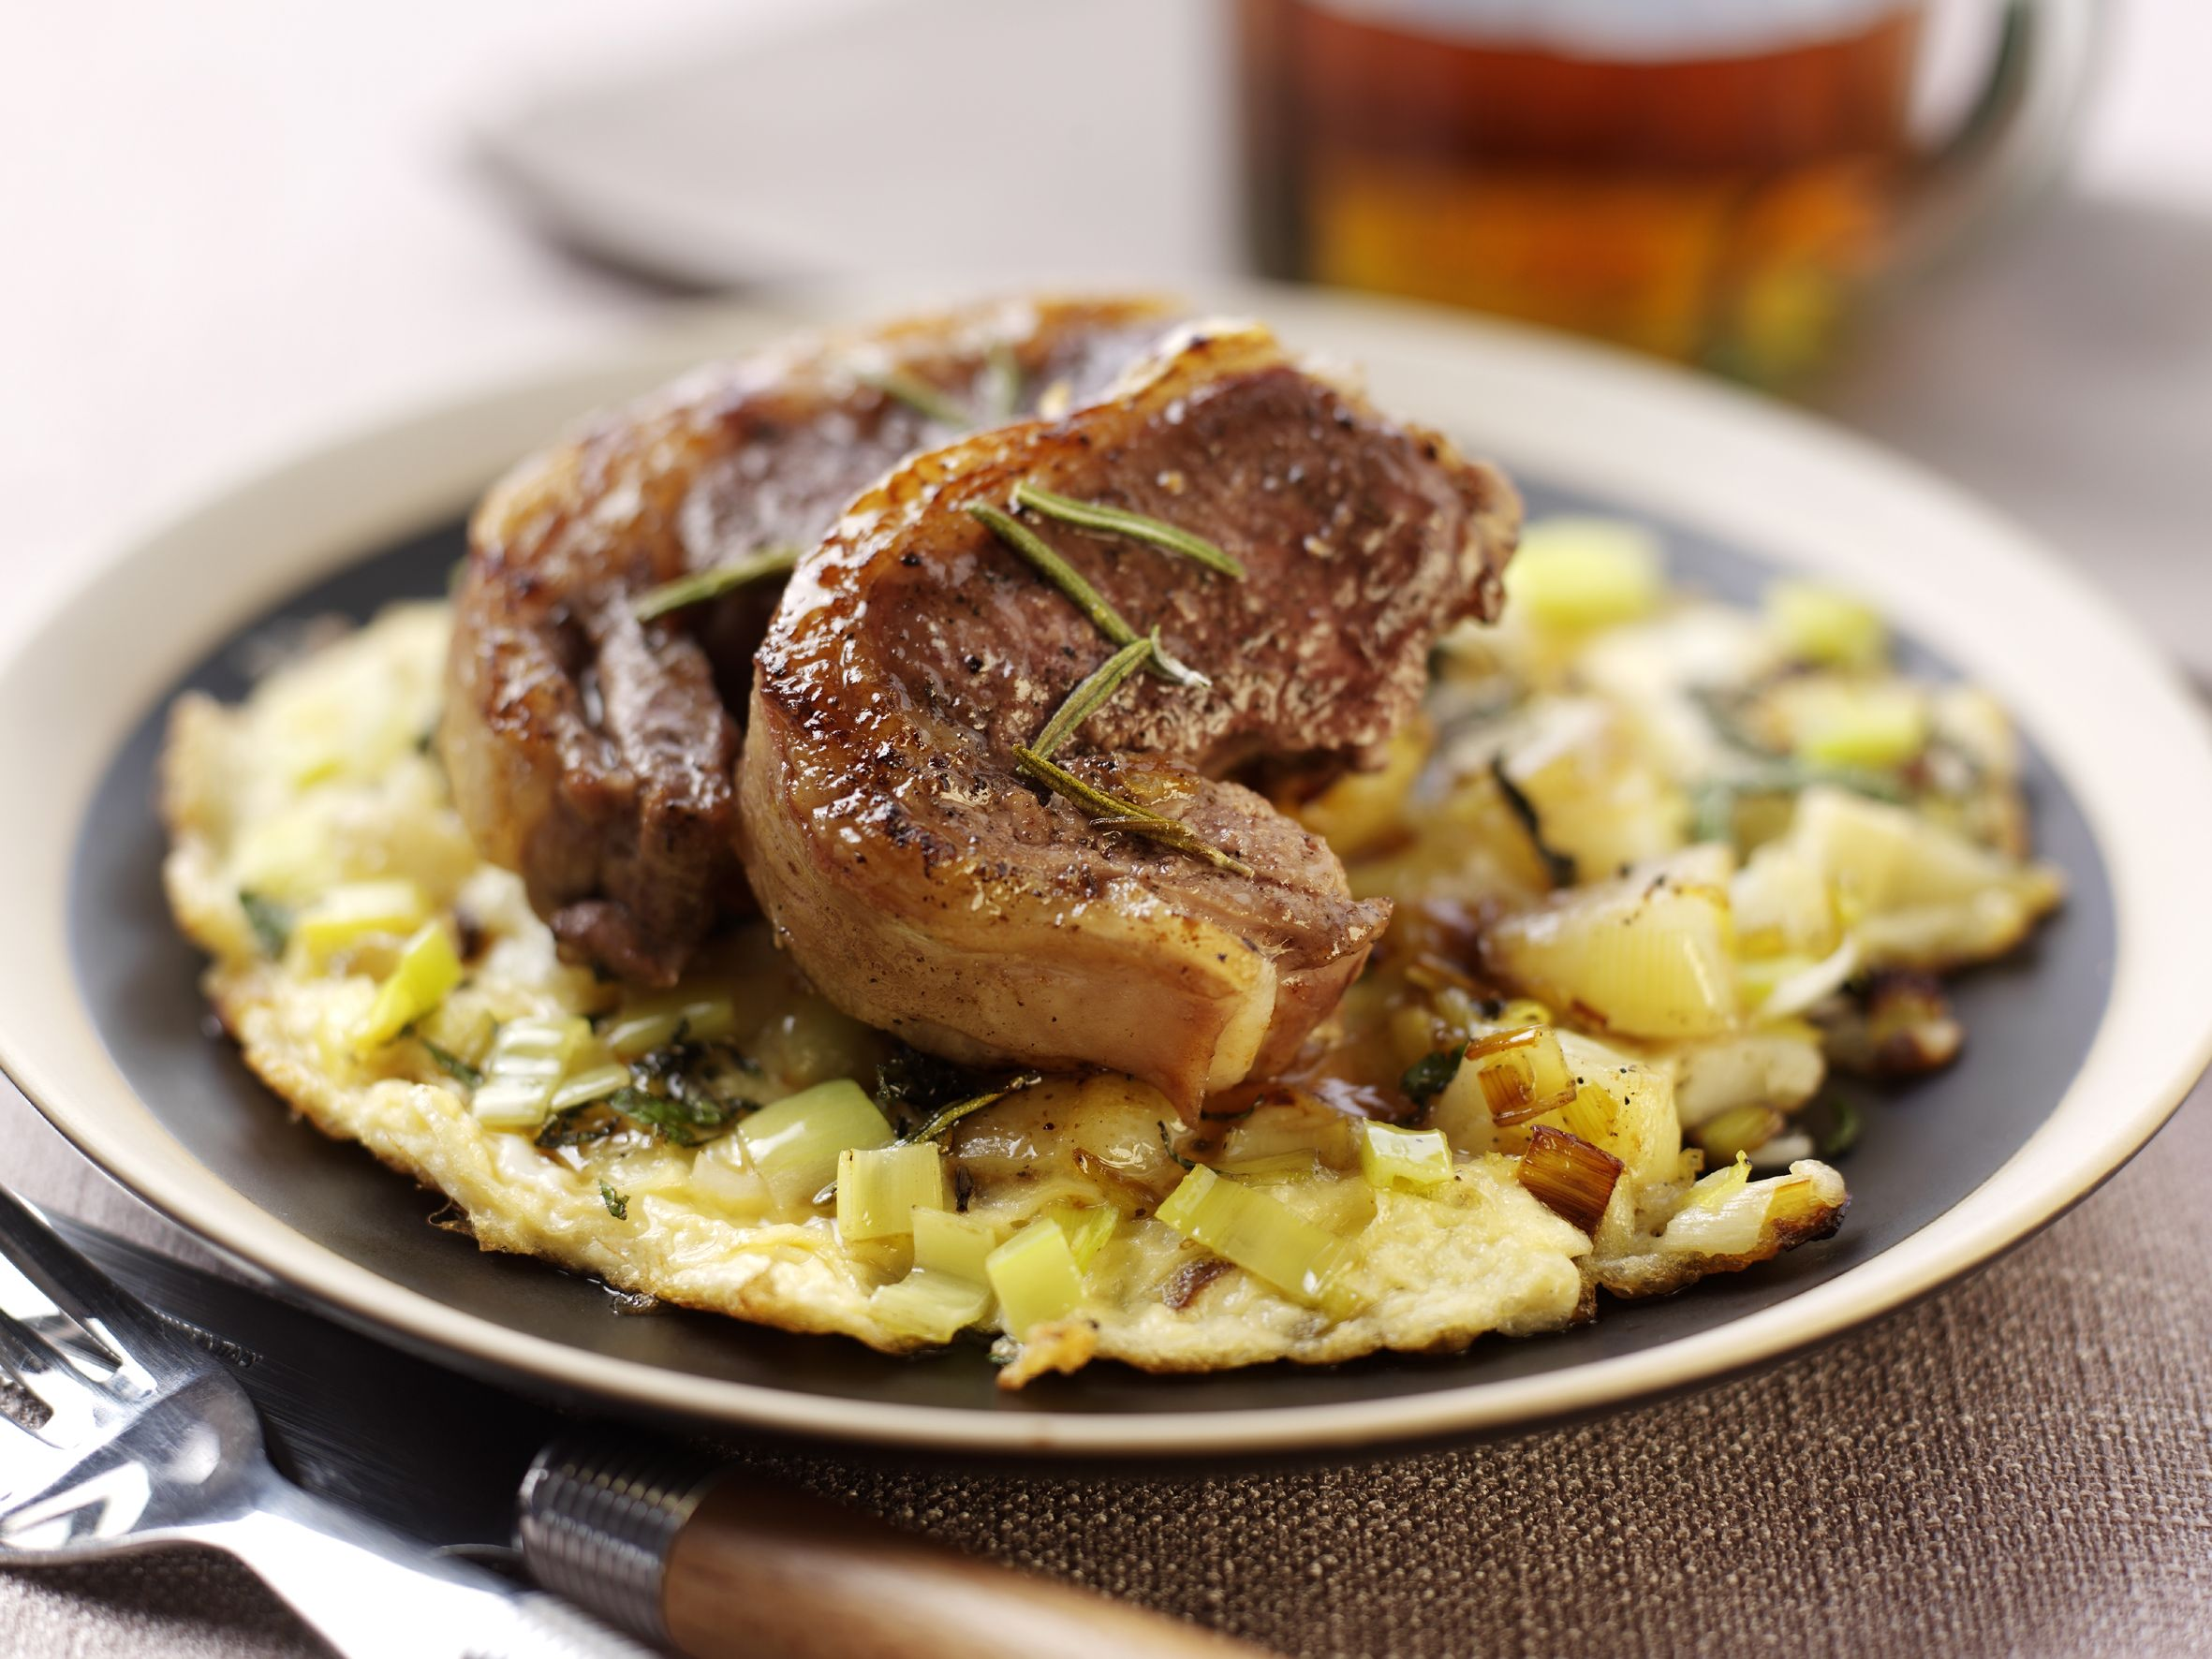 Minted Leek And Potato Frittata With Lamb Noisette Www Britishleeks Co Uk